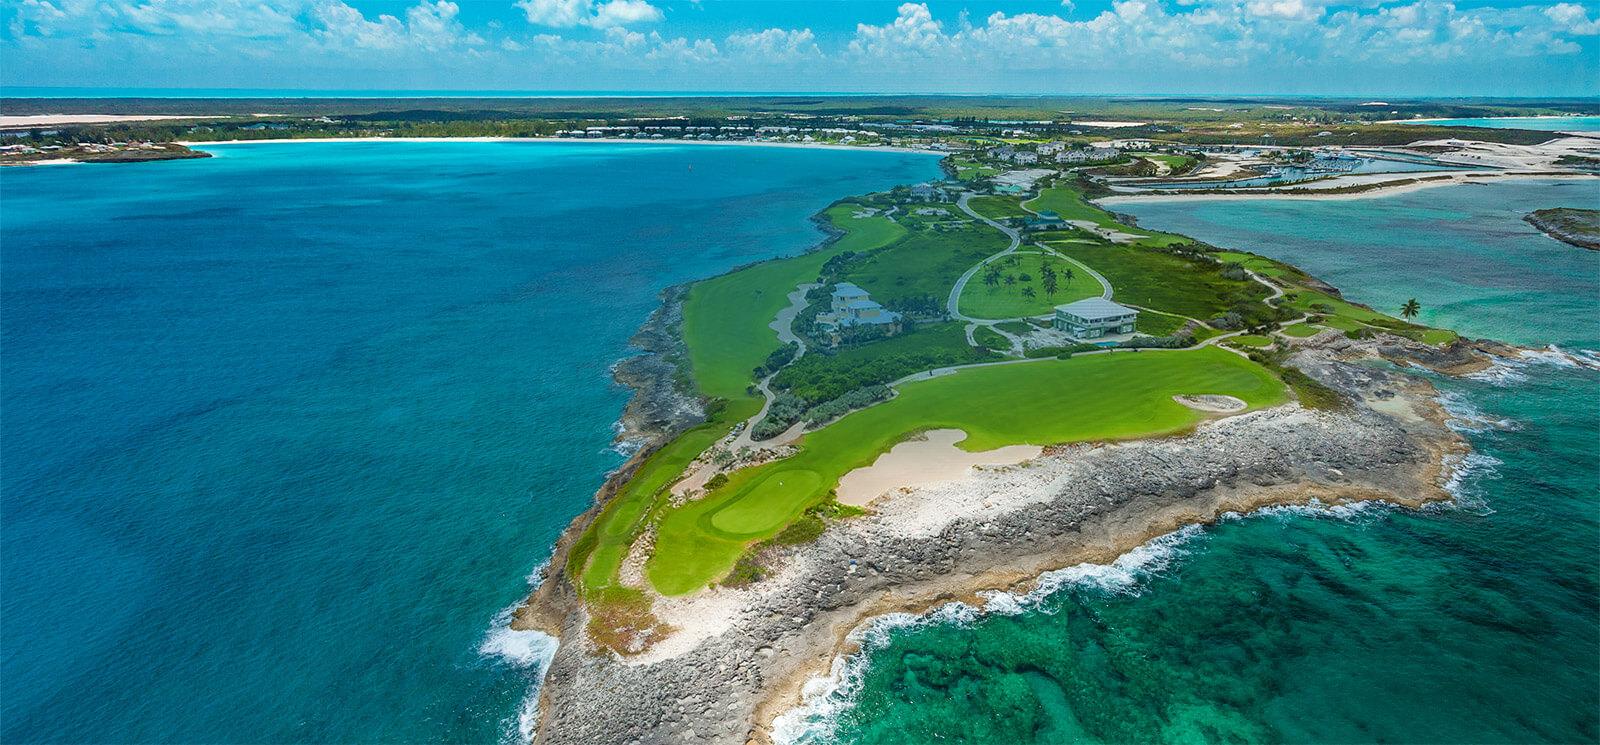 9ebca51f1 golf in Bahamas. Sandals Emerald Bay Golf Course